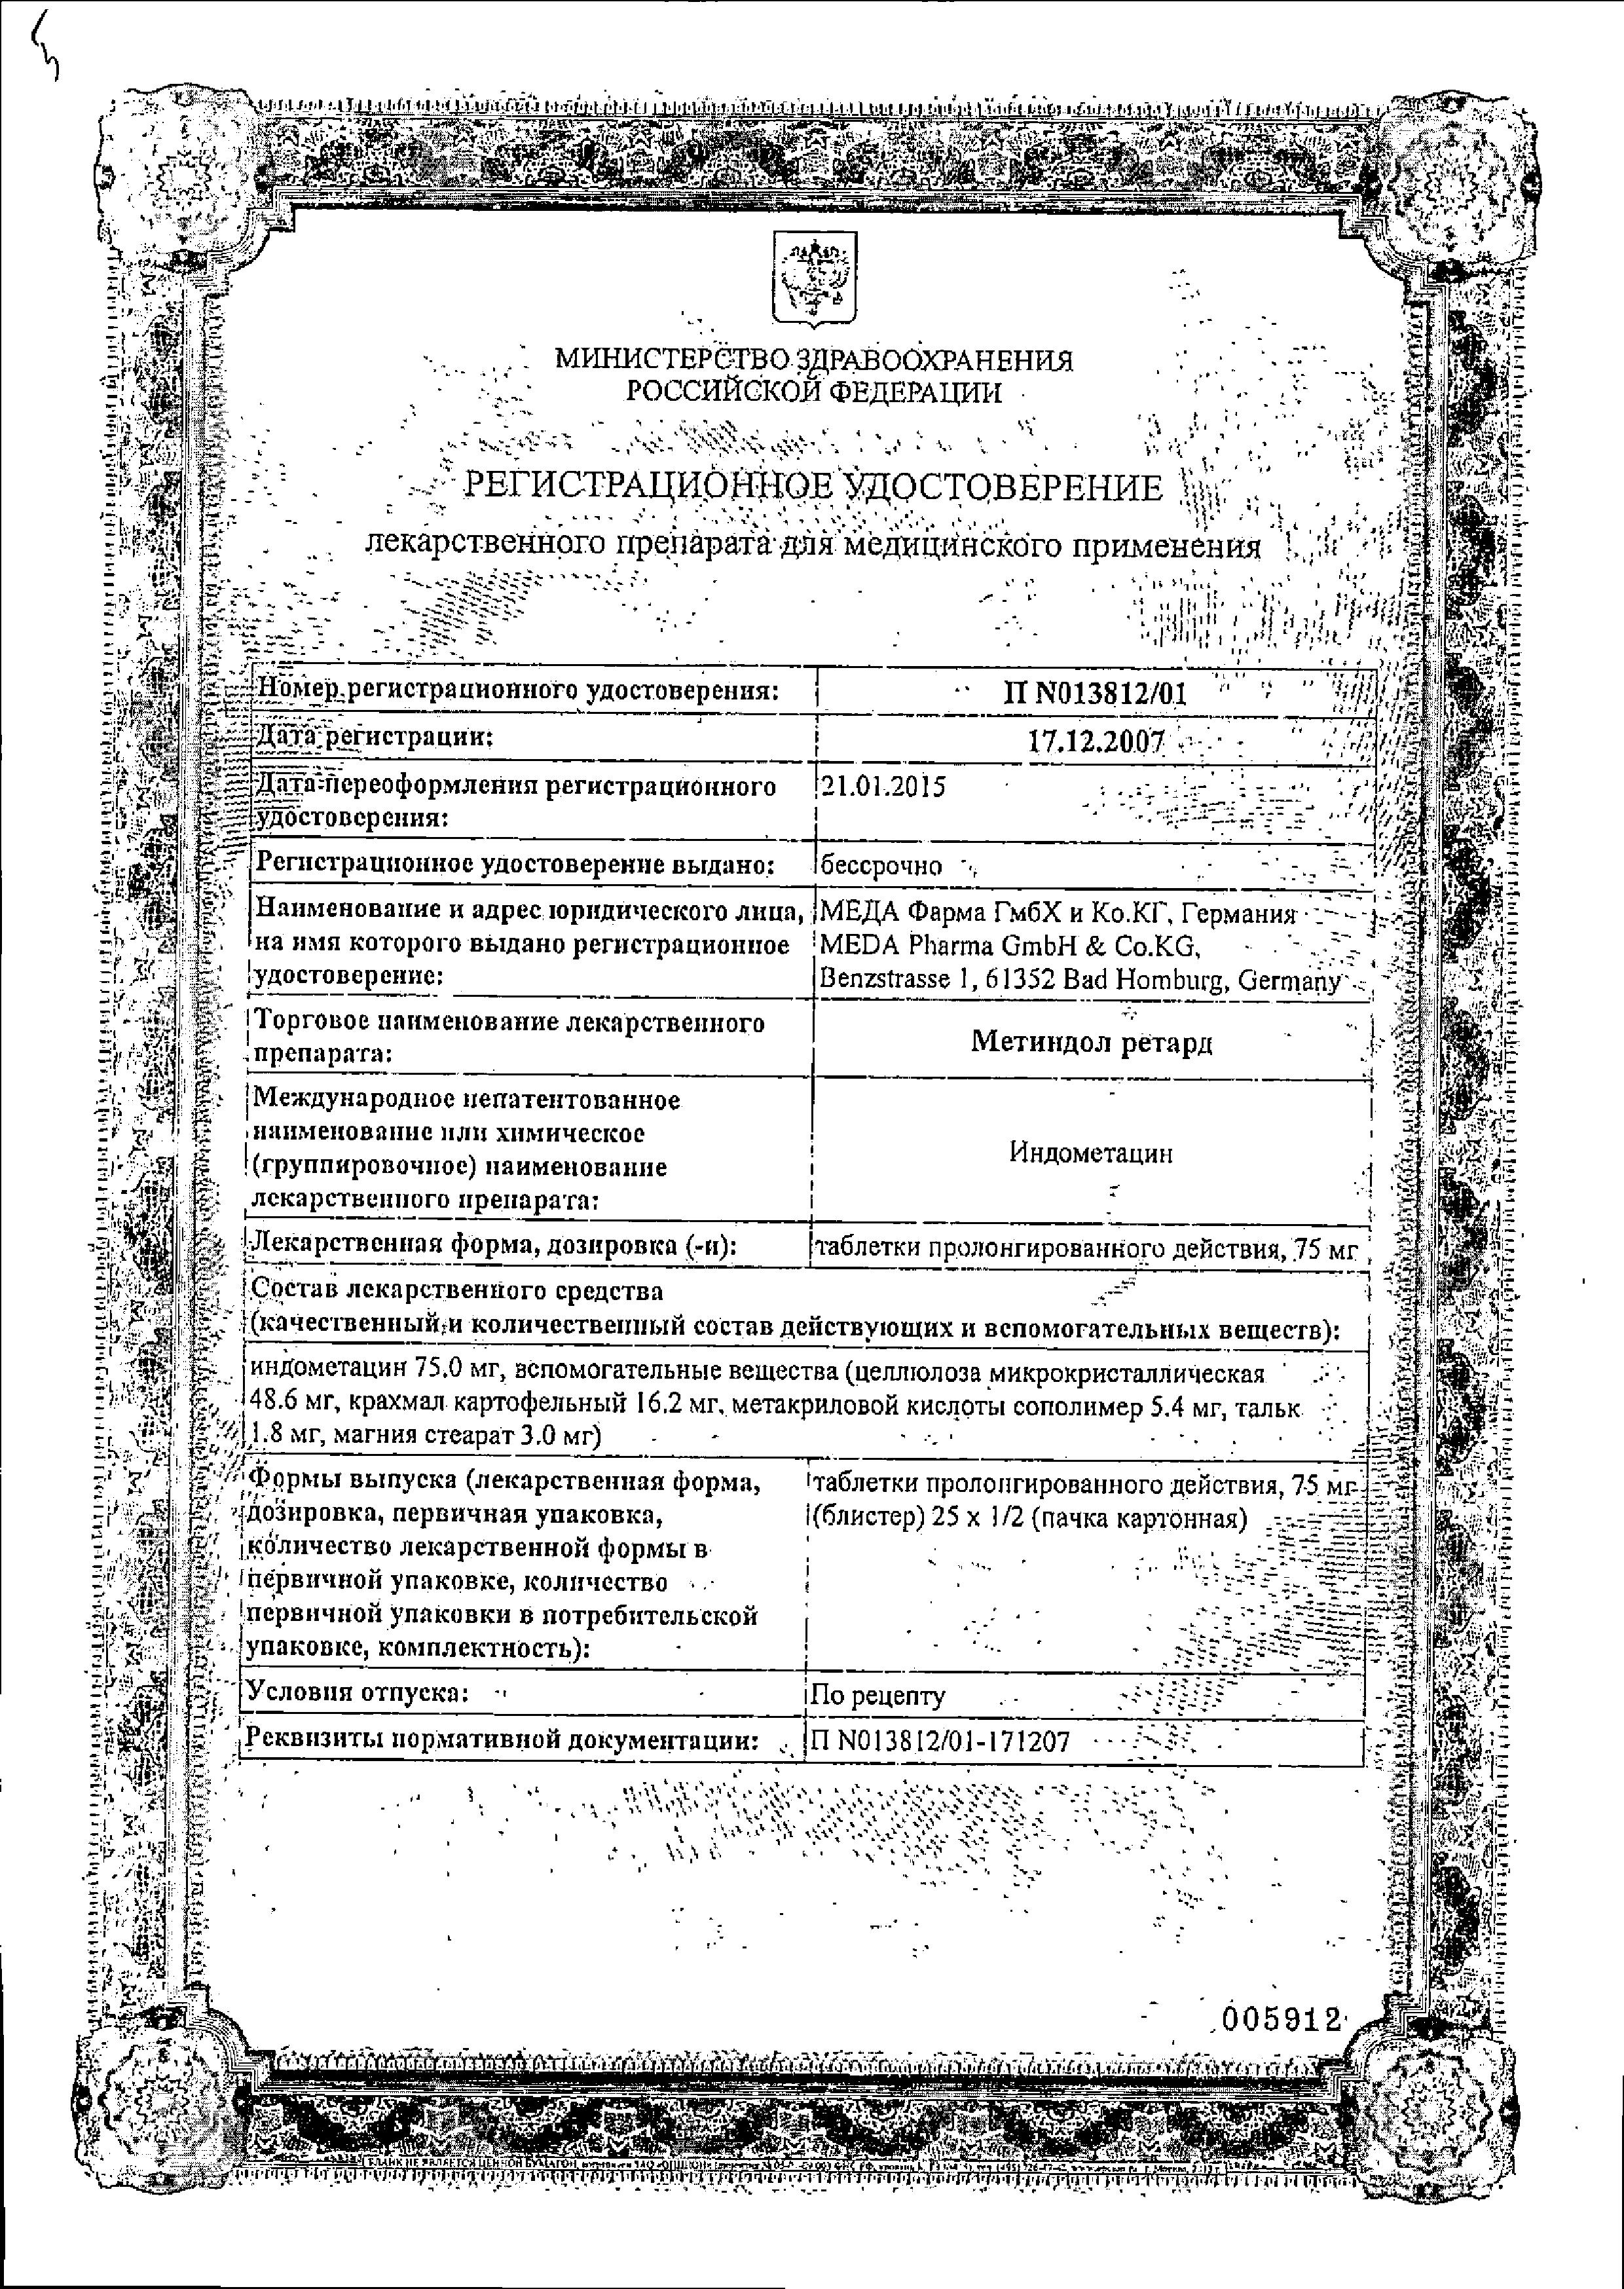 Метиндол ретард сертификат